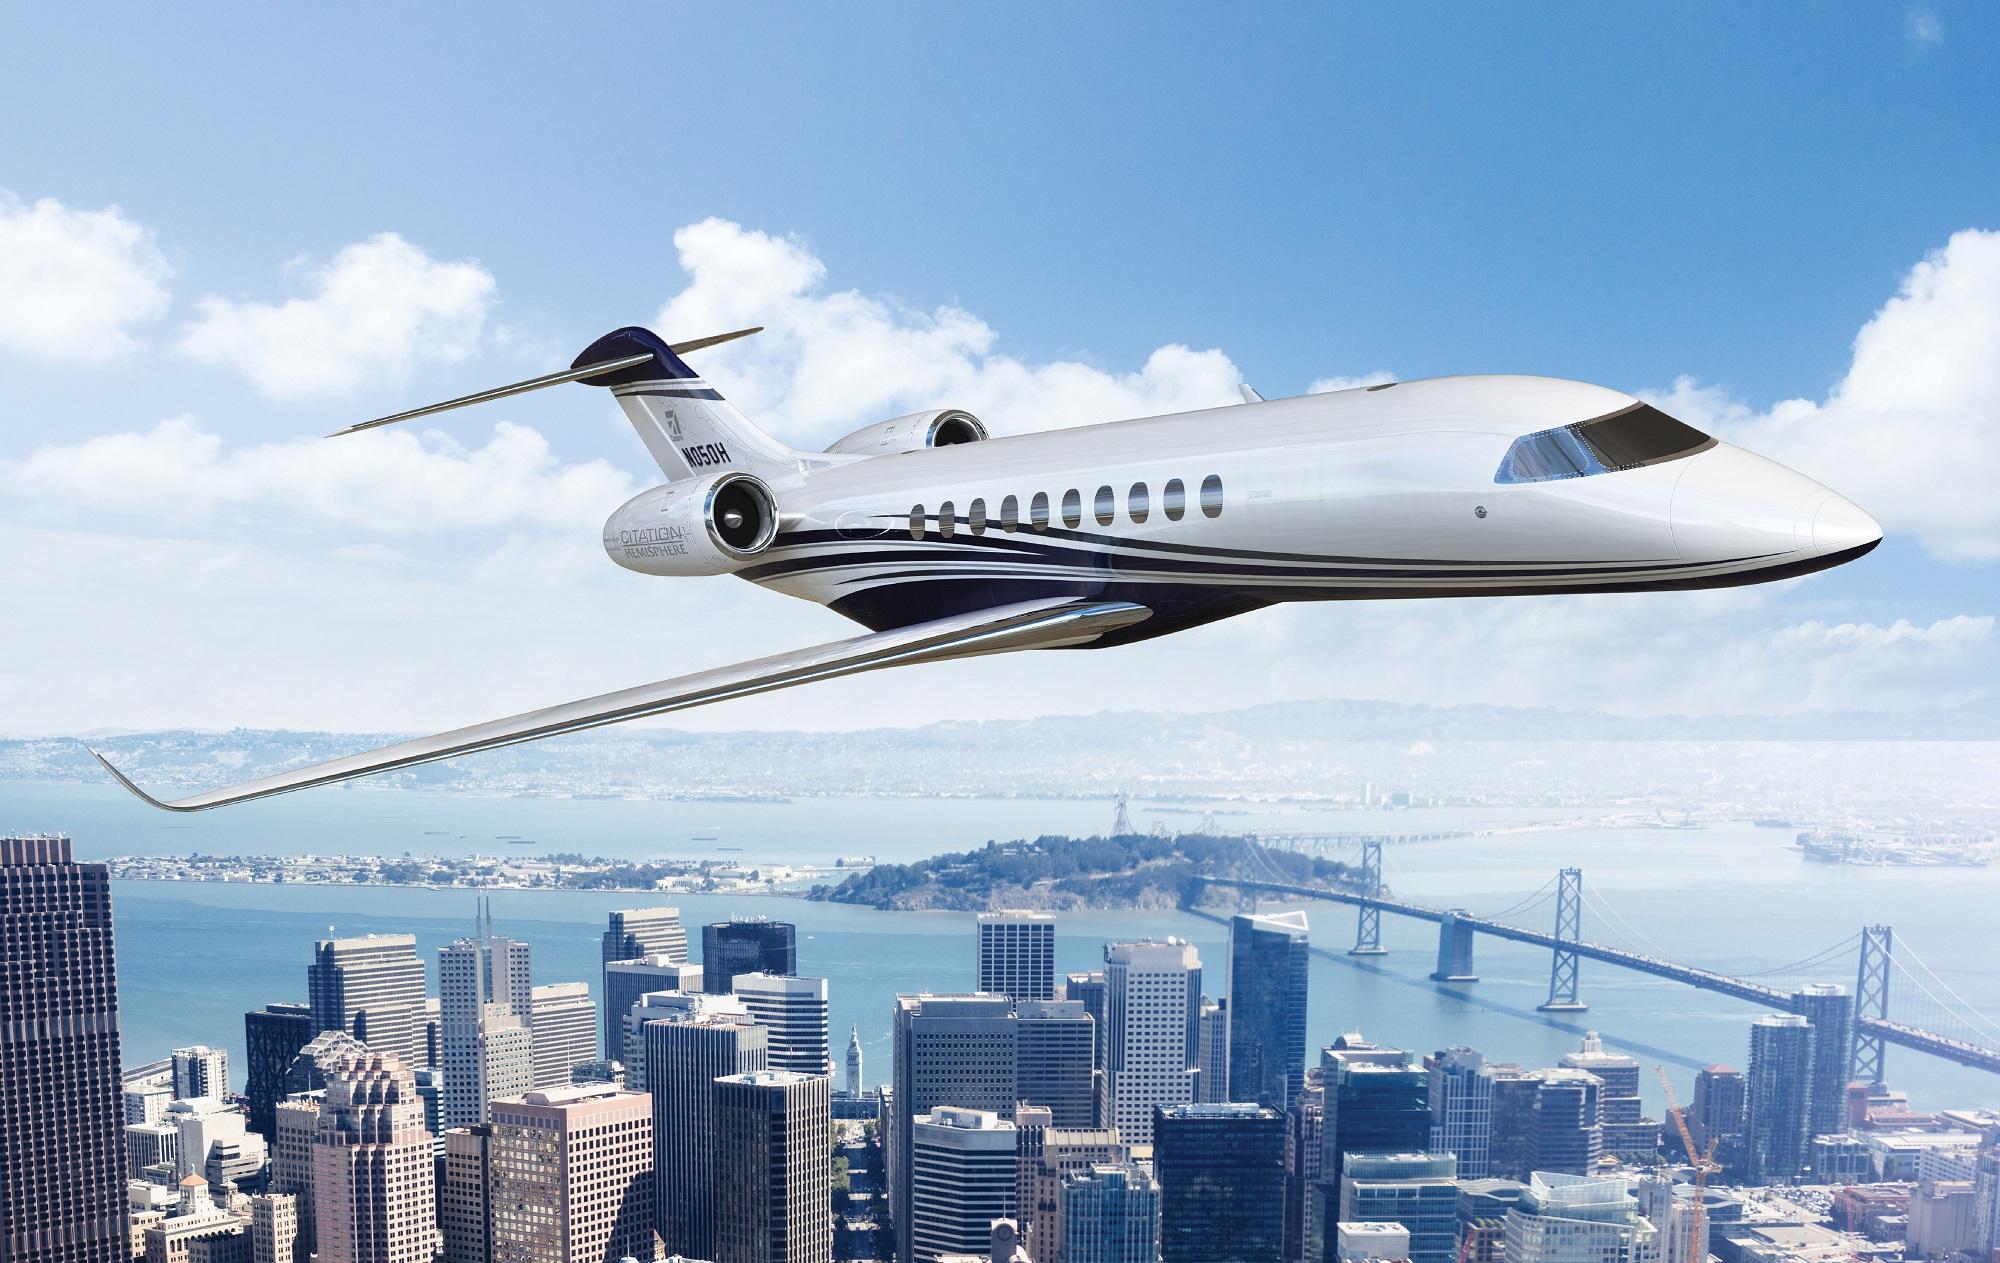 Textron Cessna Hemisphere jet flying above a city